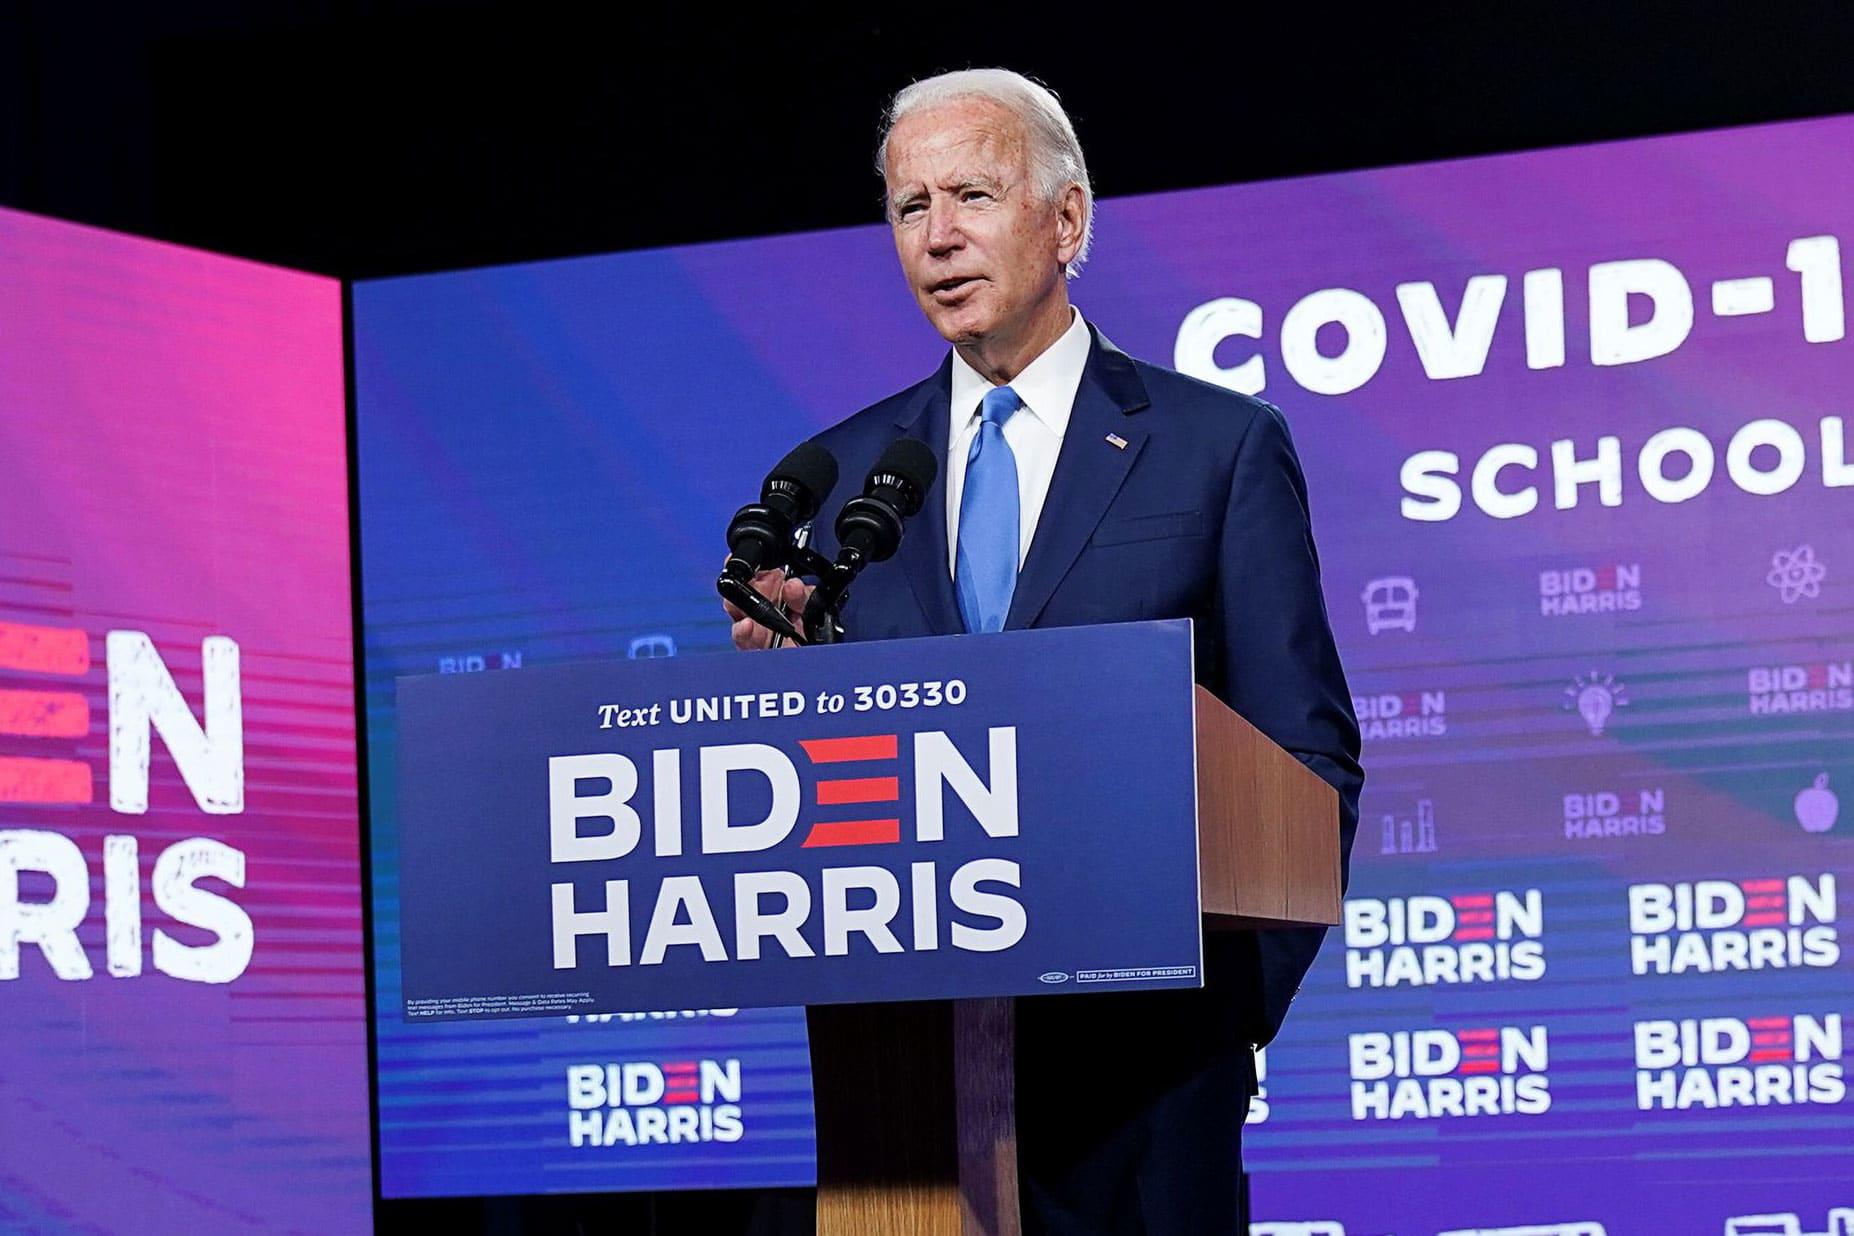 Biden still ahead in the polls, but Trump narrows gap after RNC